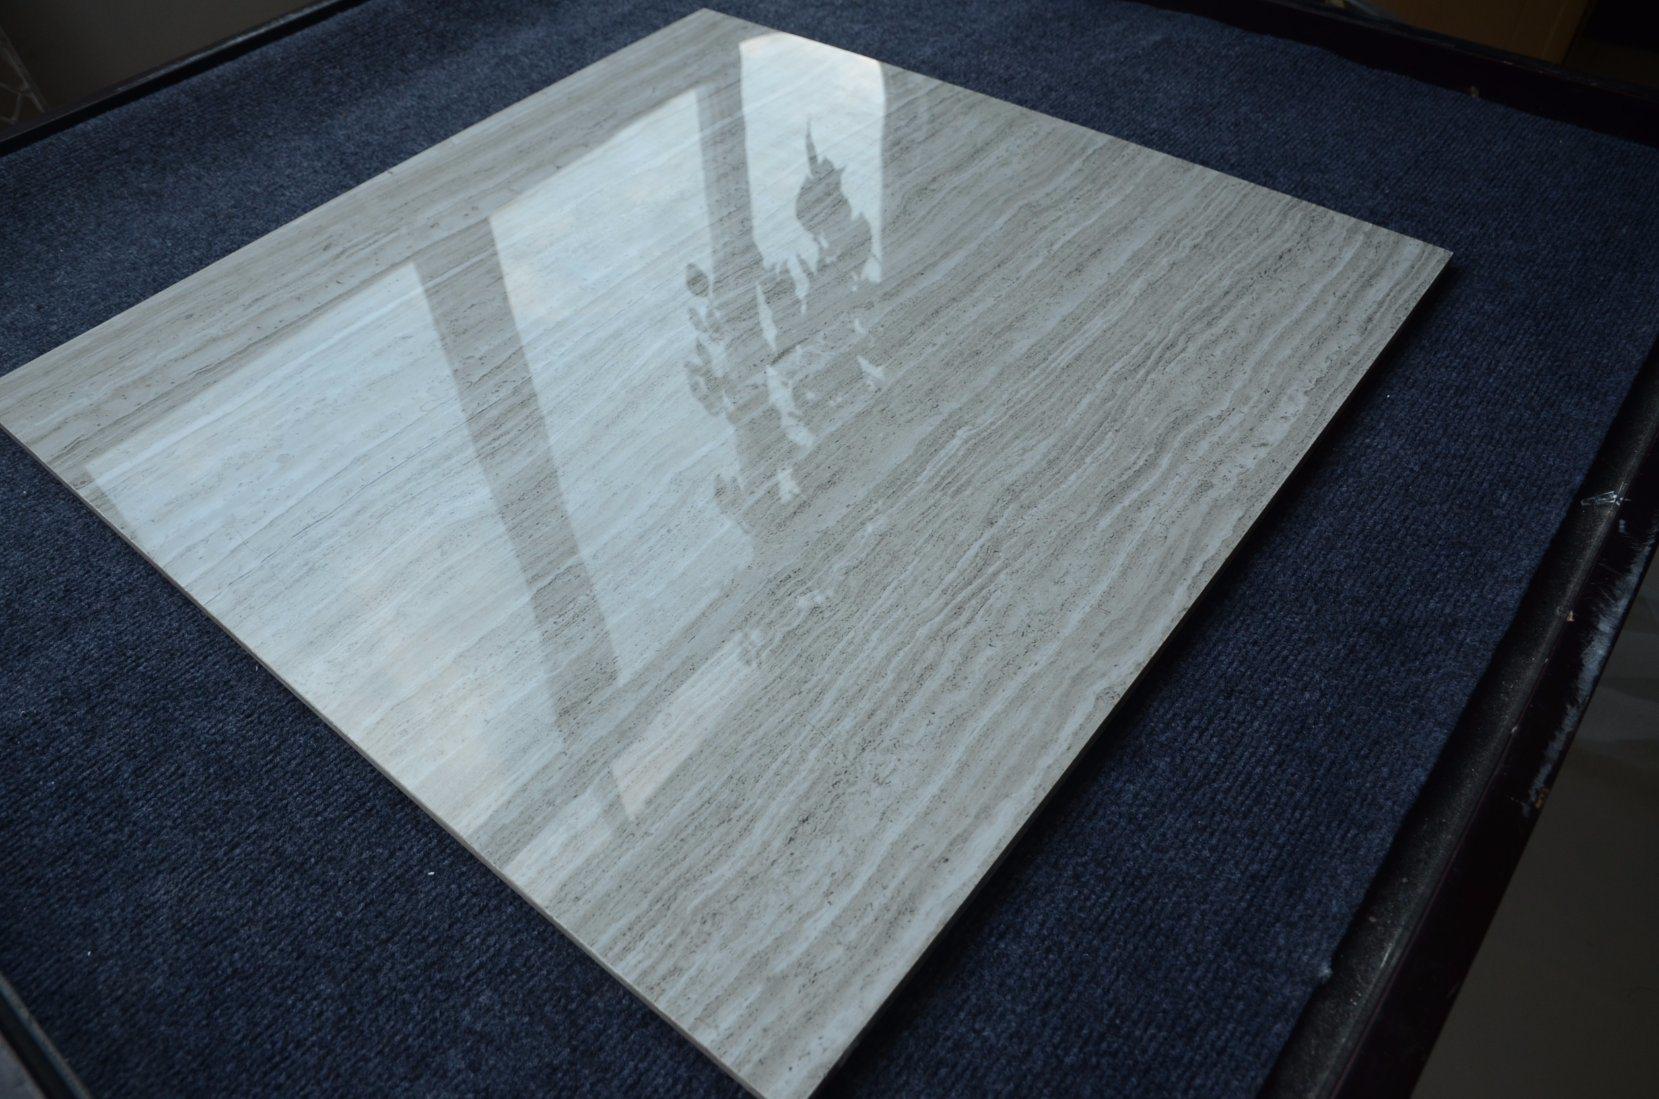 China Wholesale Imitation Travertine Gray Bathroom Ceramic Floor ...